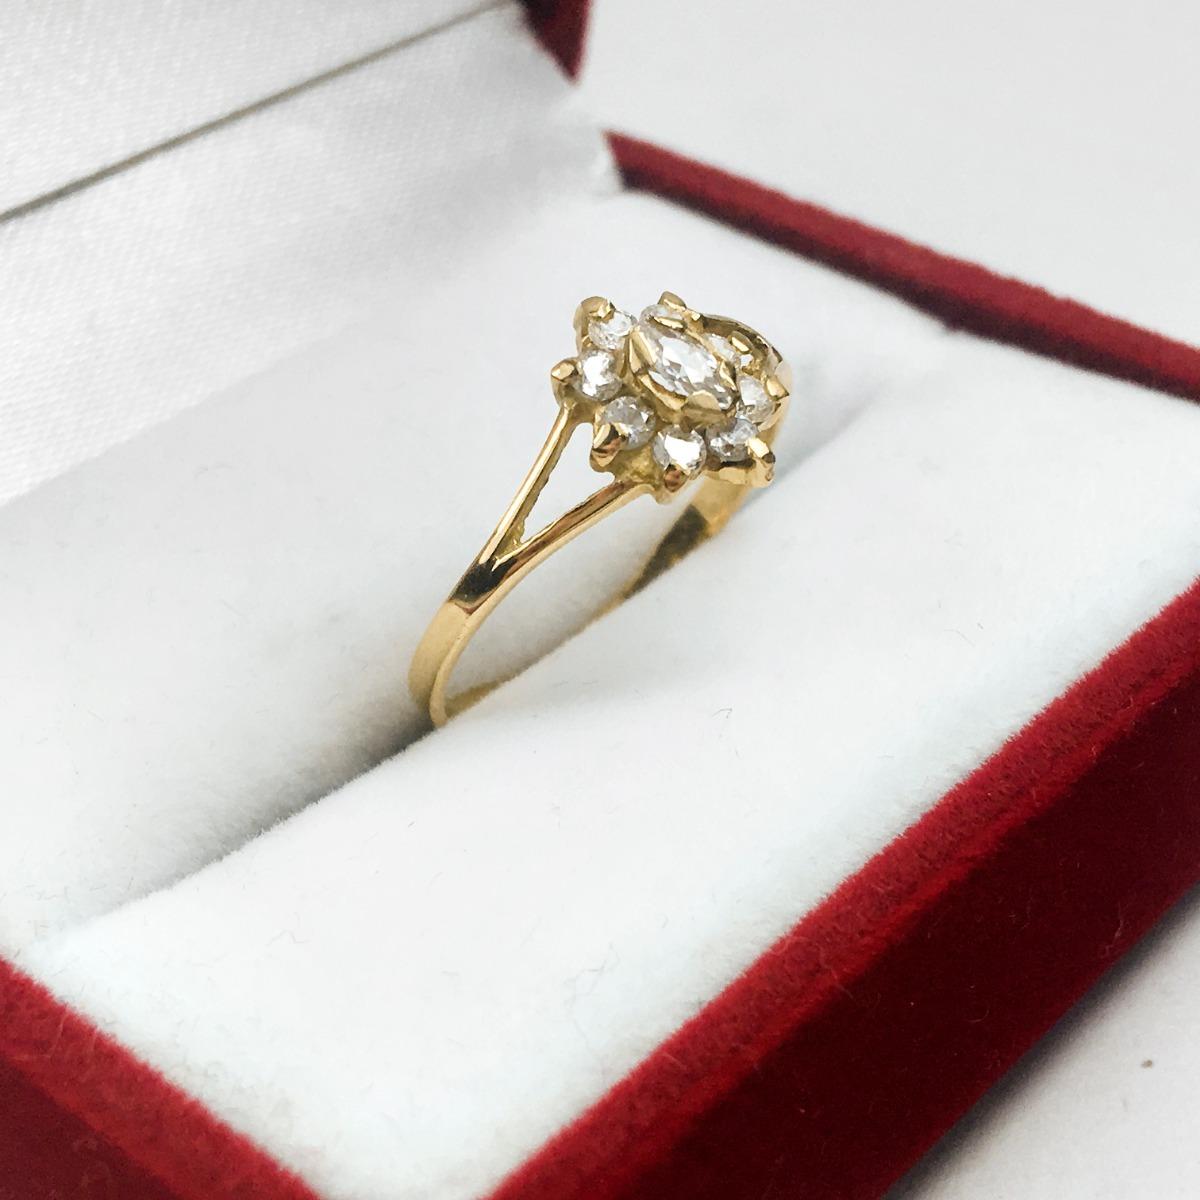 b3aff089e621 anillo oro 18k cintillo roseta con cubics mujer 15 años. Cargando zoom.